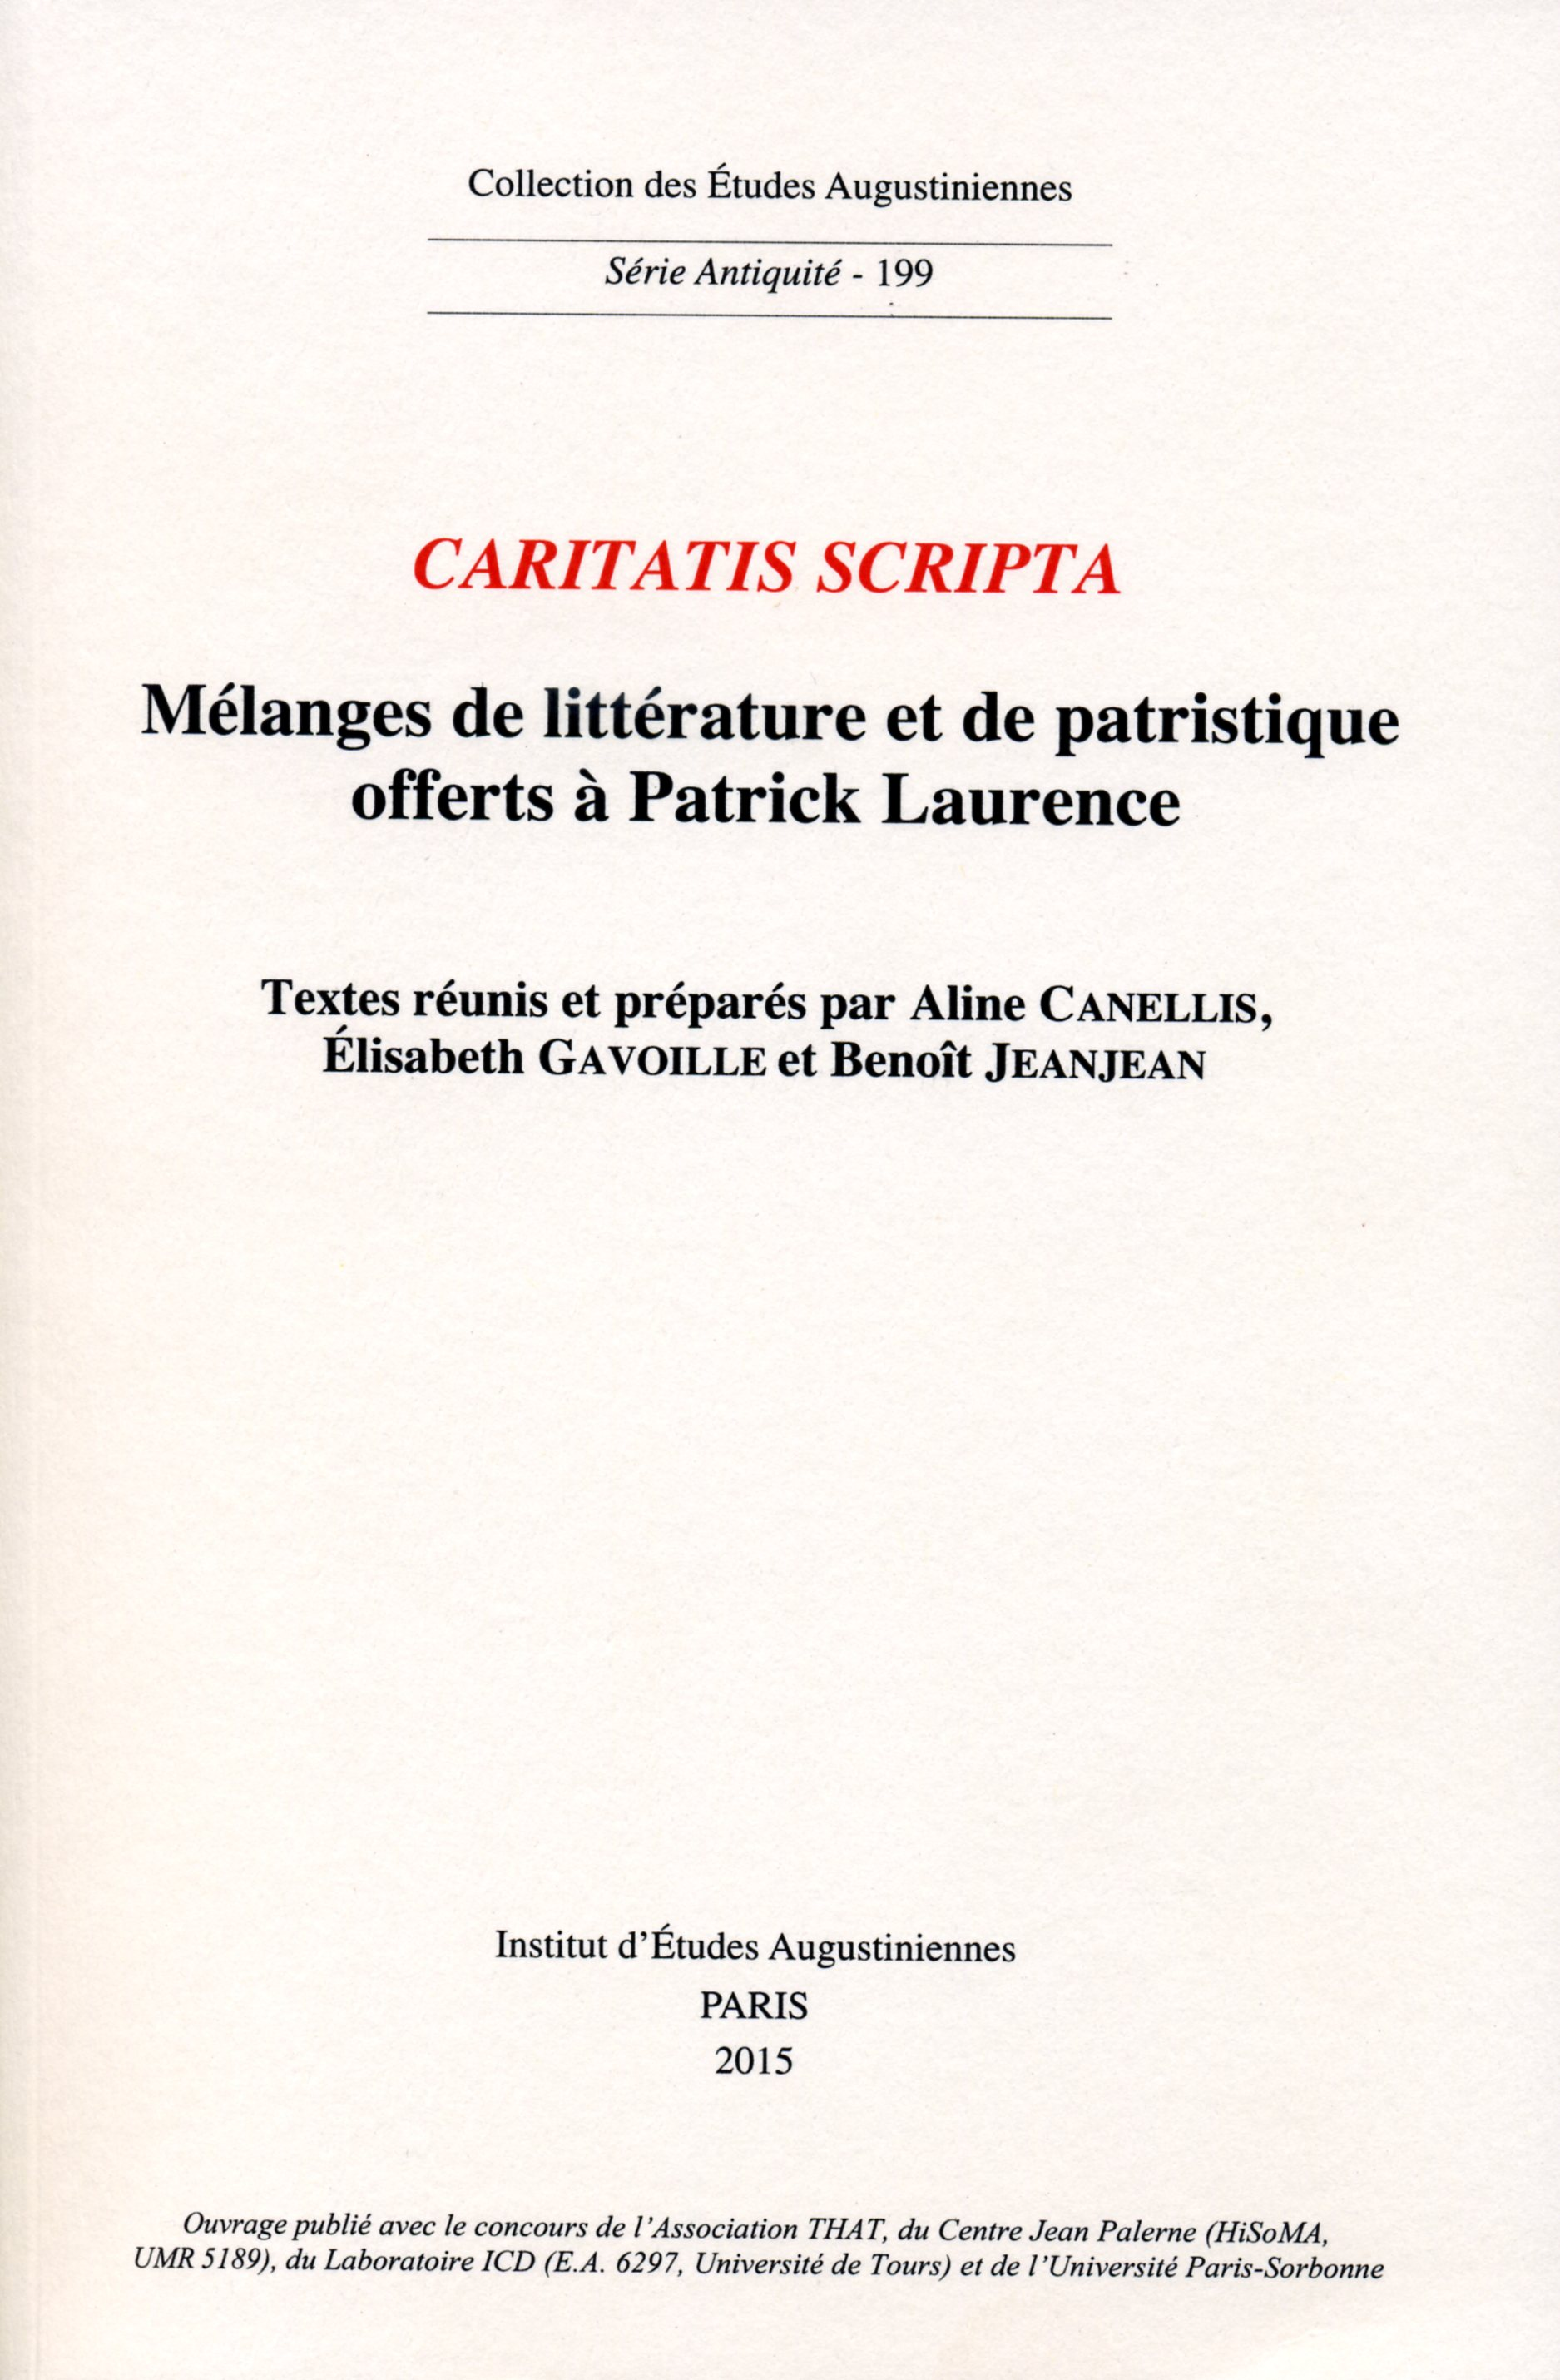 Caritatis scripta